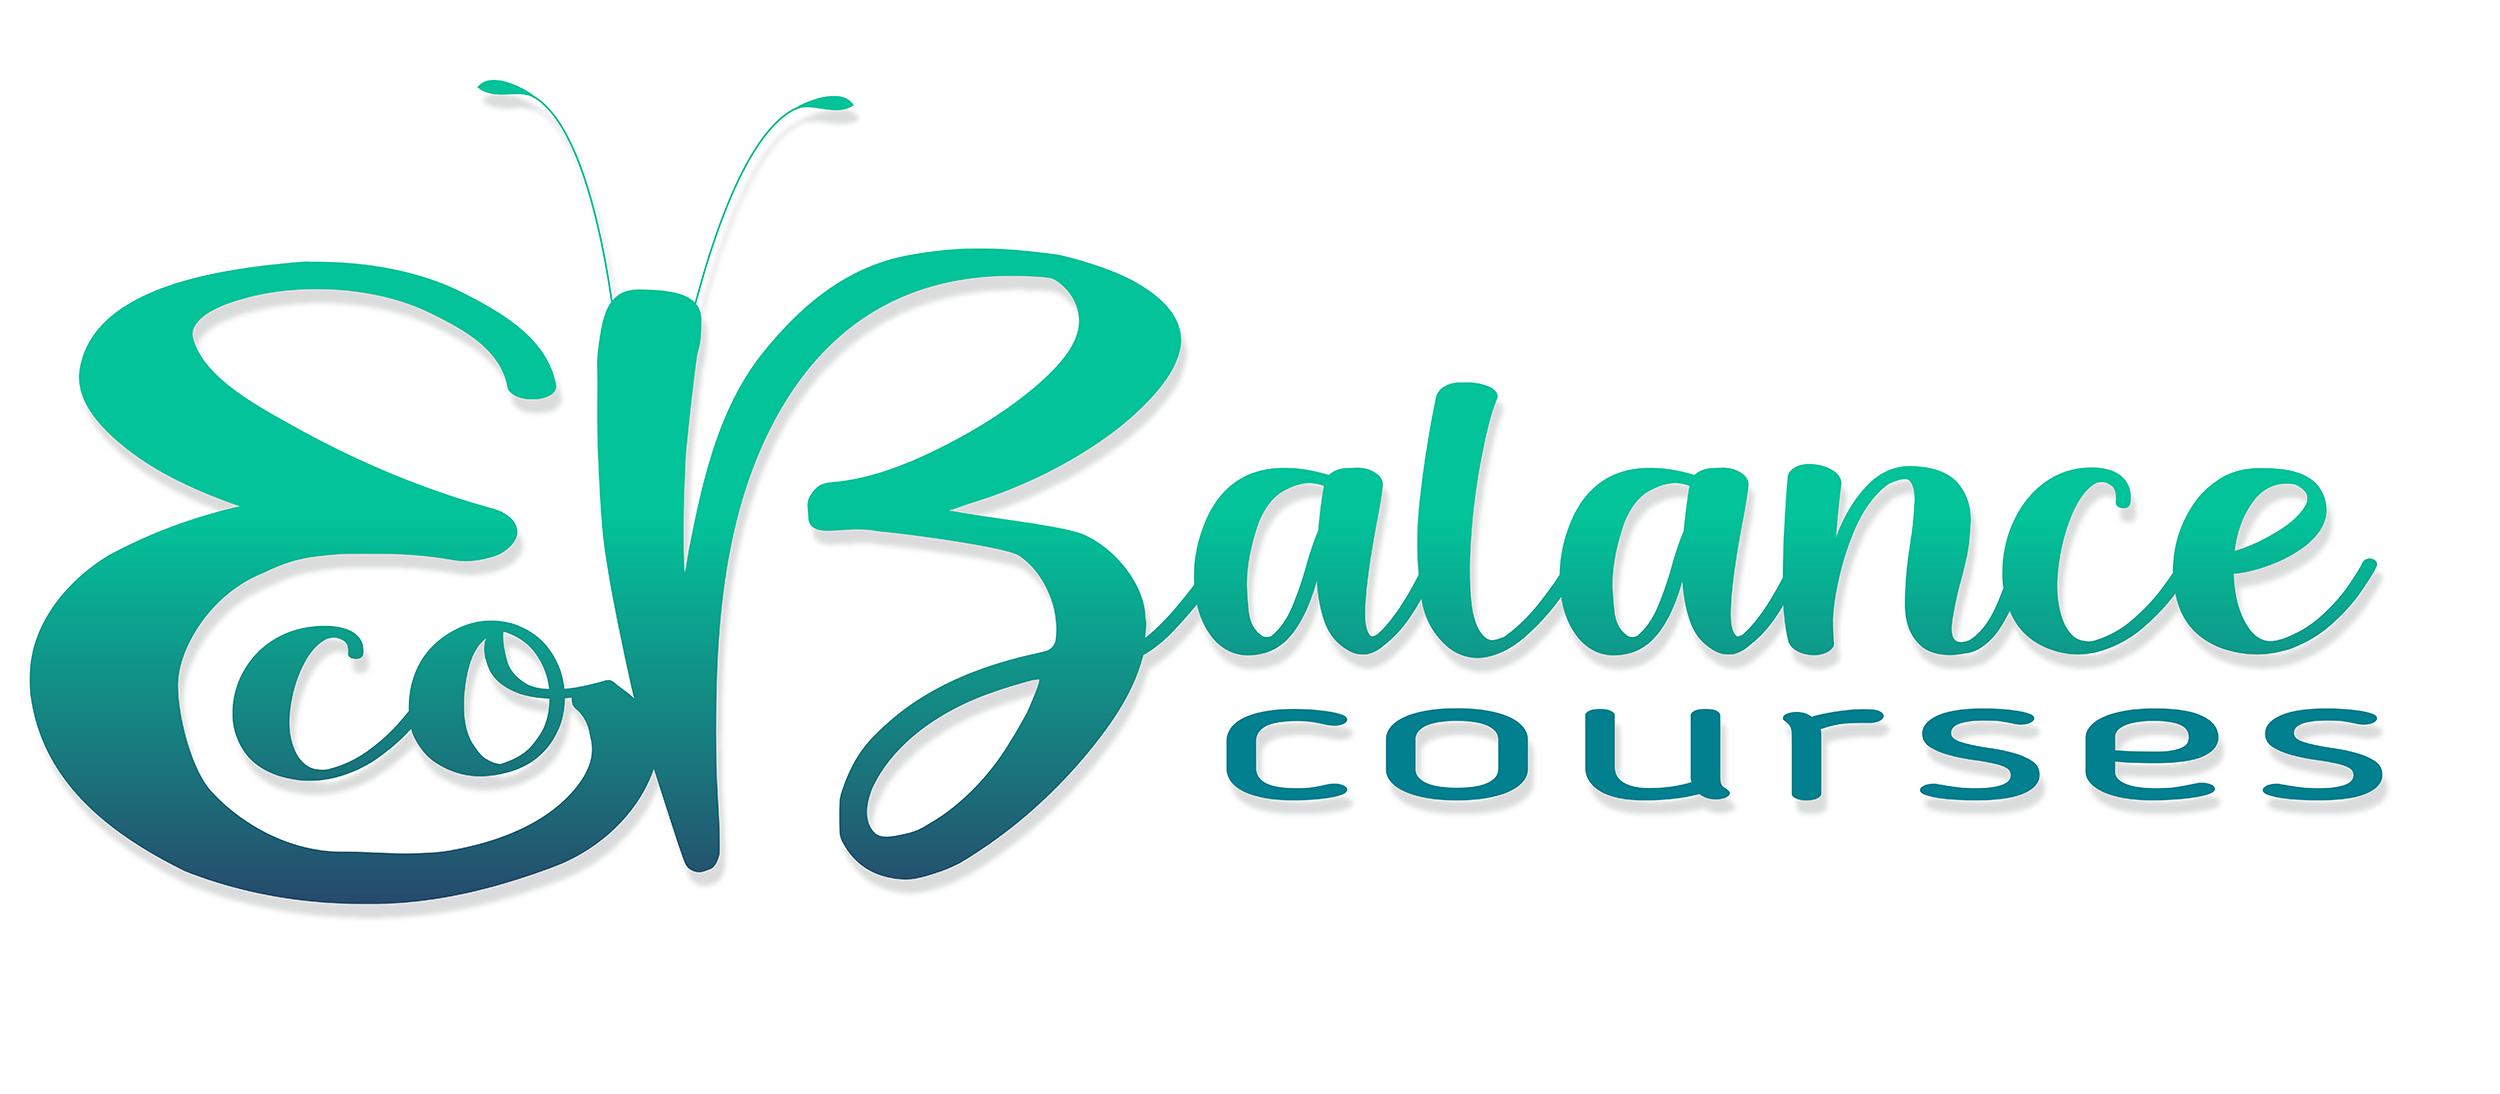 Ecobalance Courses